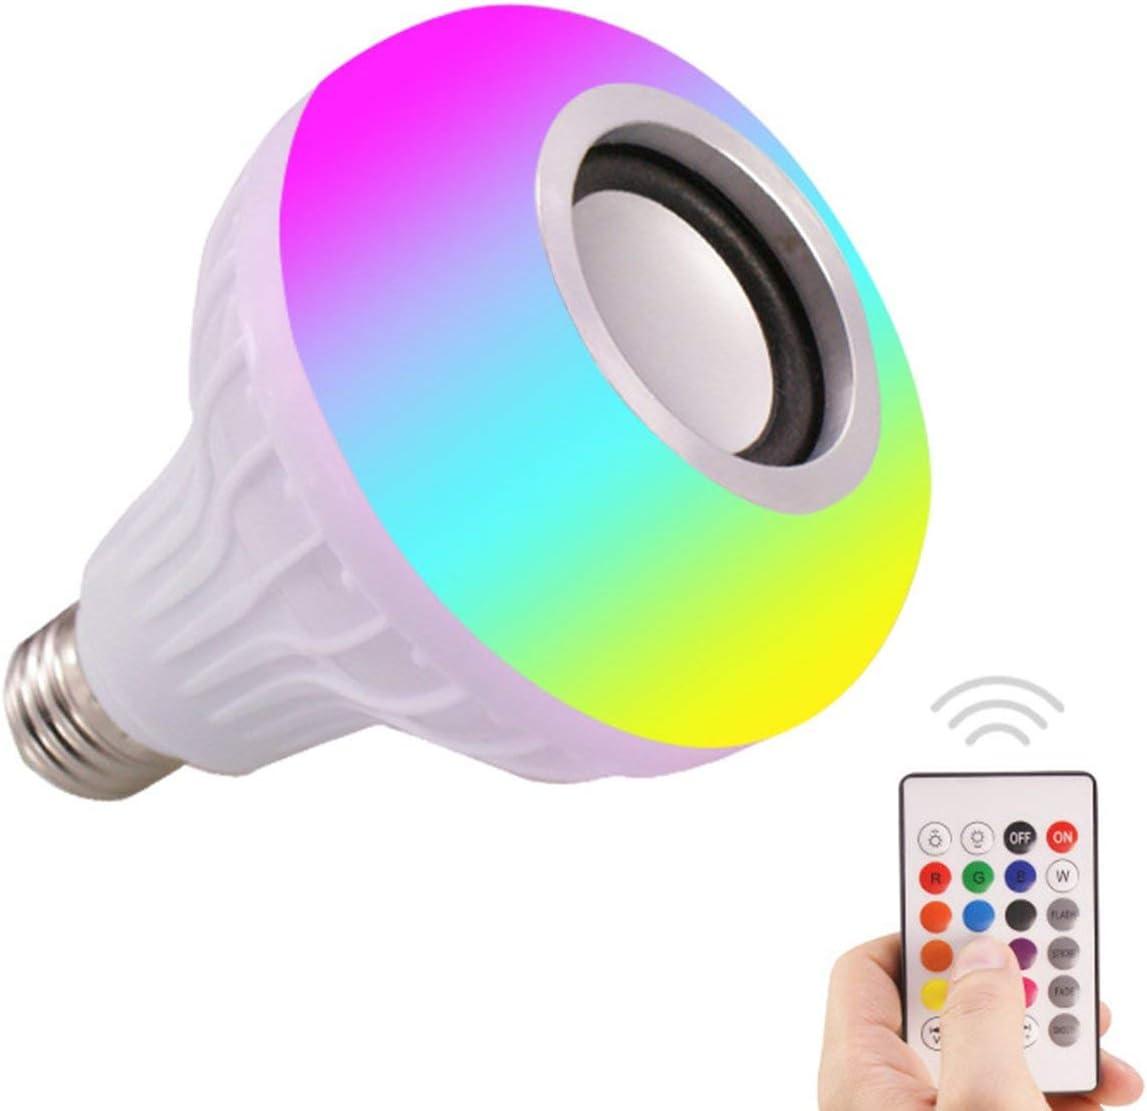 Ballylelly Smart Music Light Bulb Led Colorido Altavoz Bombilla E27 Control remoto inalámbrico Bombilla de audio 12W 220V RGB Bombilla Luz Reproductor de música